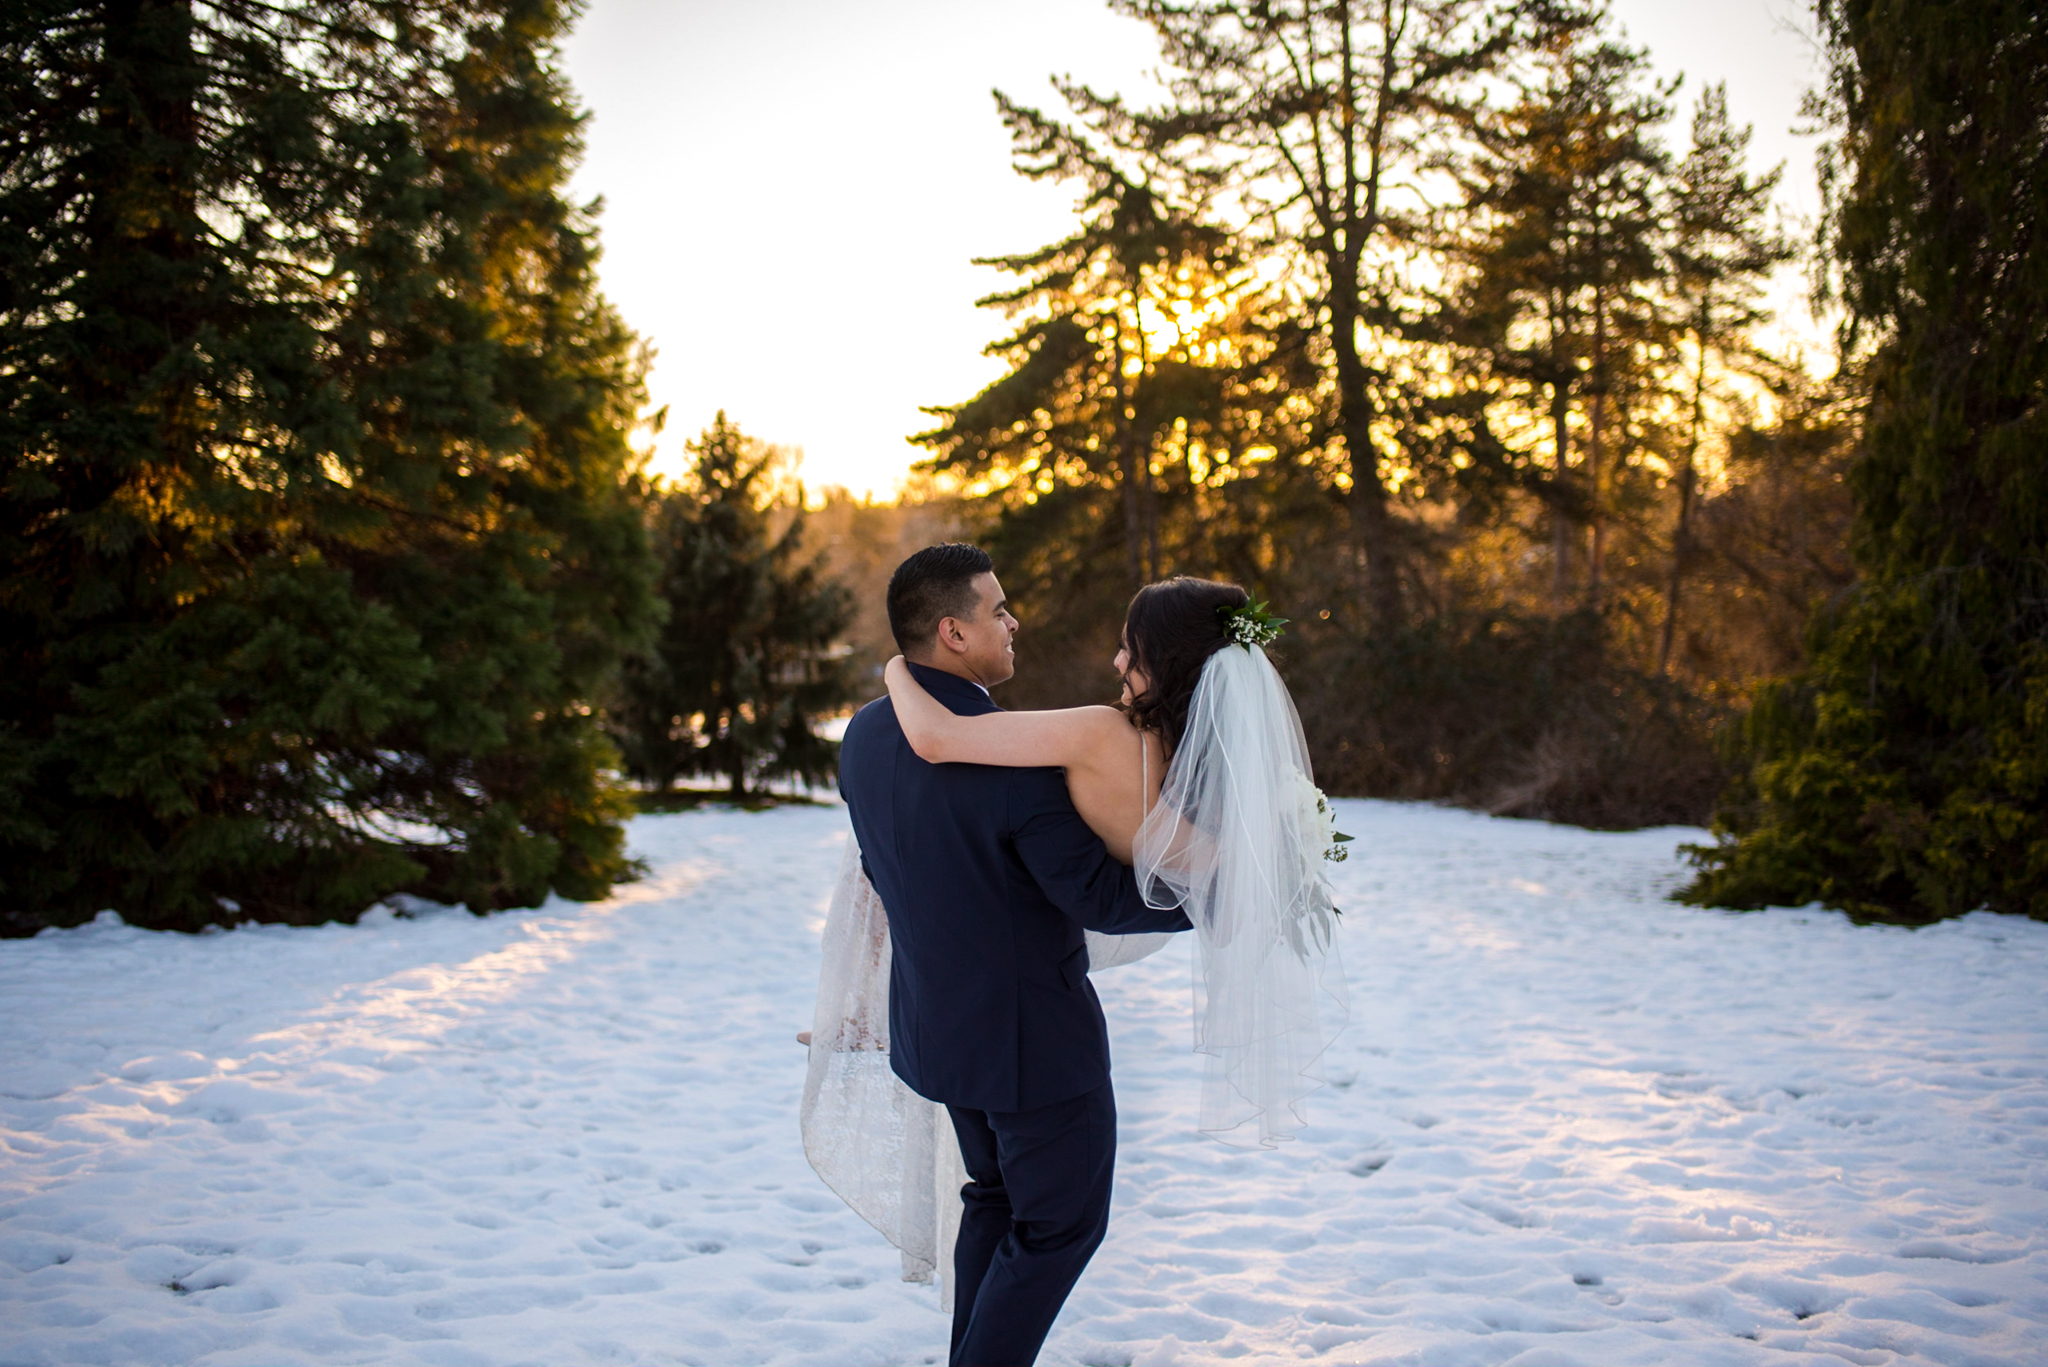 Queen Elizabeth Park Winter Wedding Photography in Vancouver BC